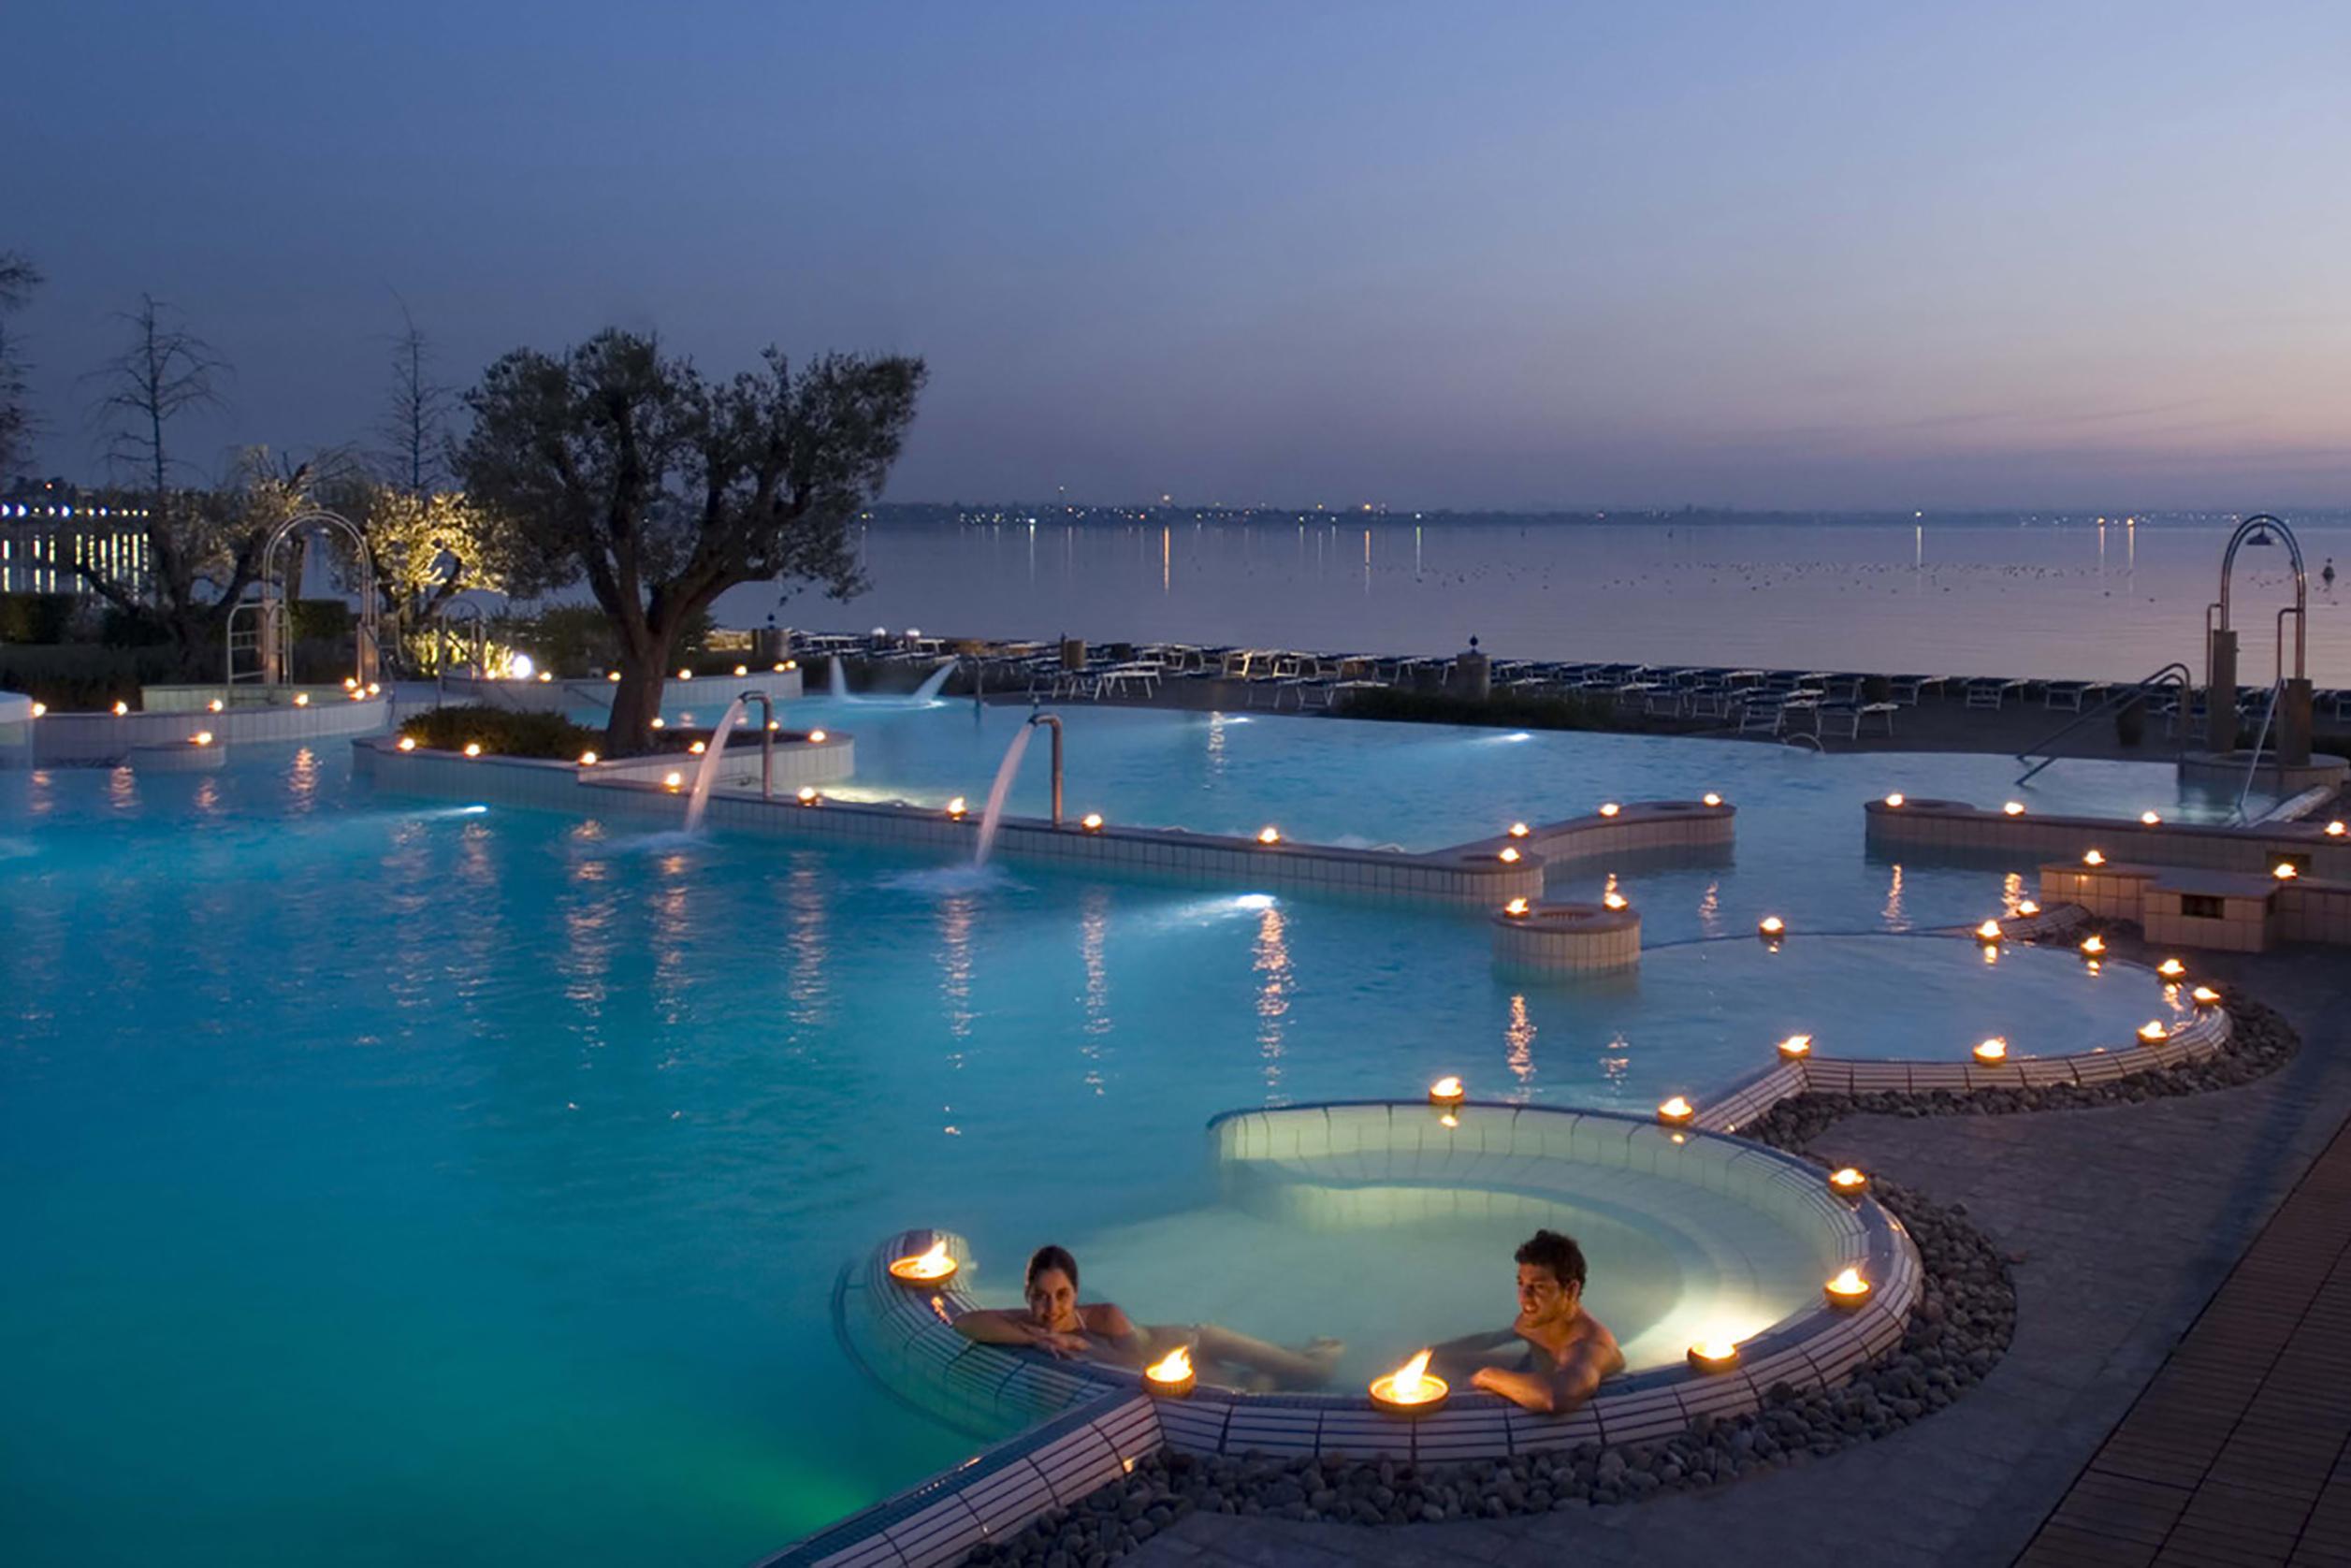 Aquaria Terme di Sirmione lago di Garda